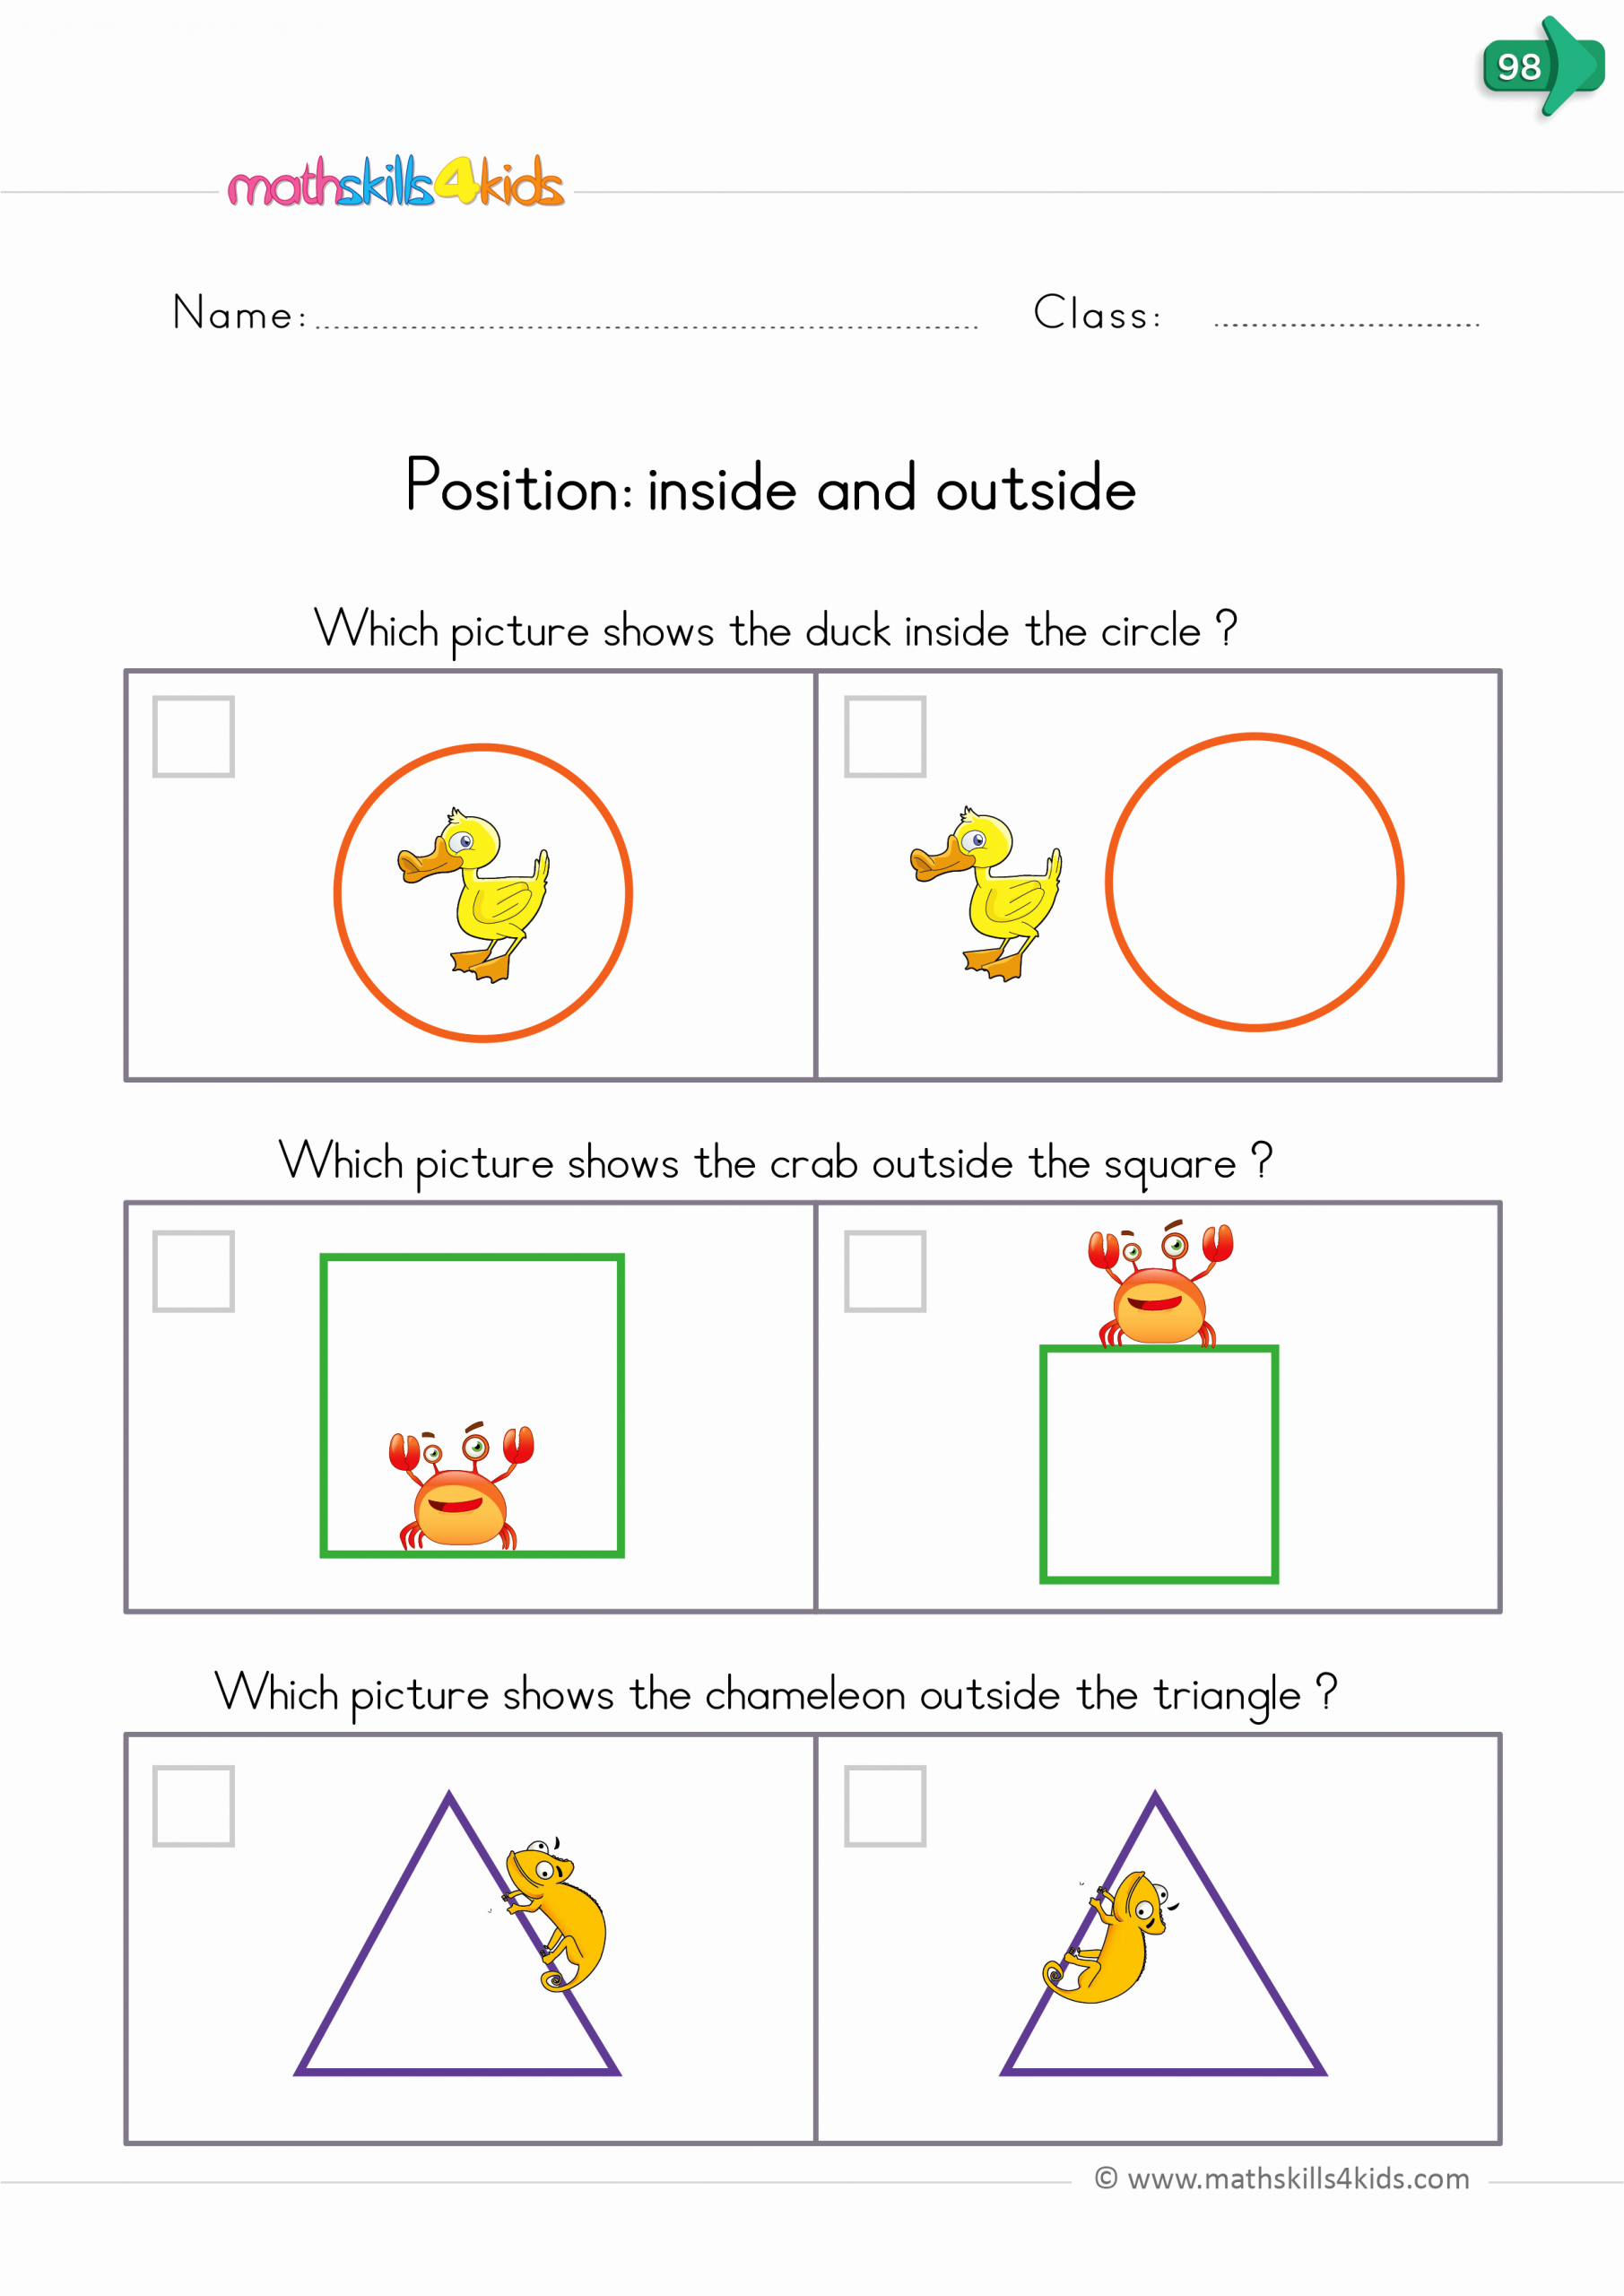 Positional Words Worksheets for Preschool Elegant Position Worksheets for Kindergarten